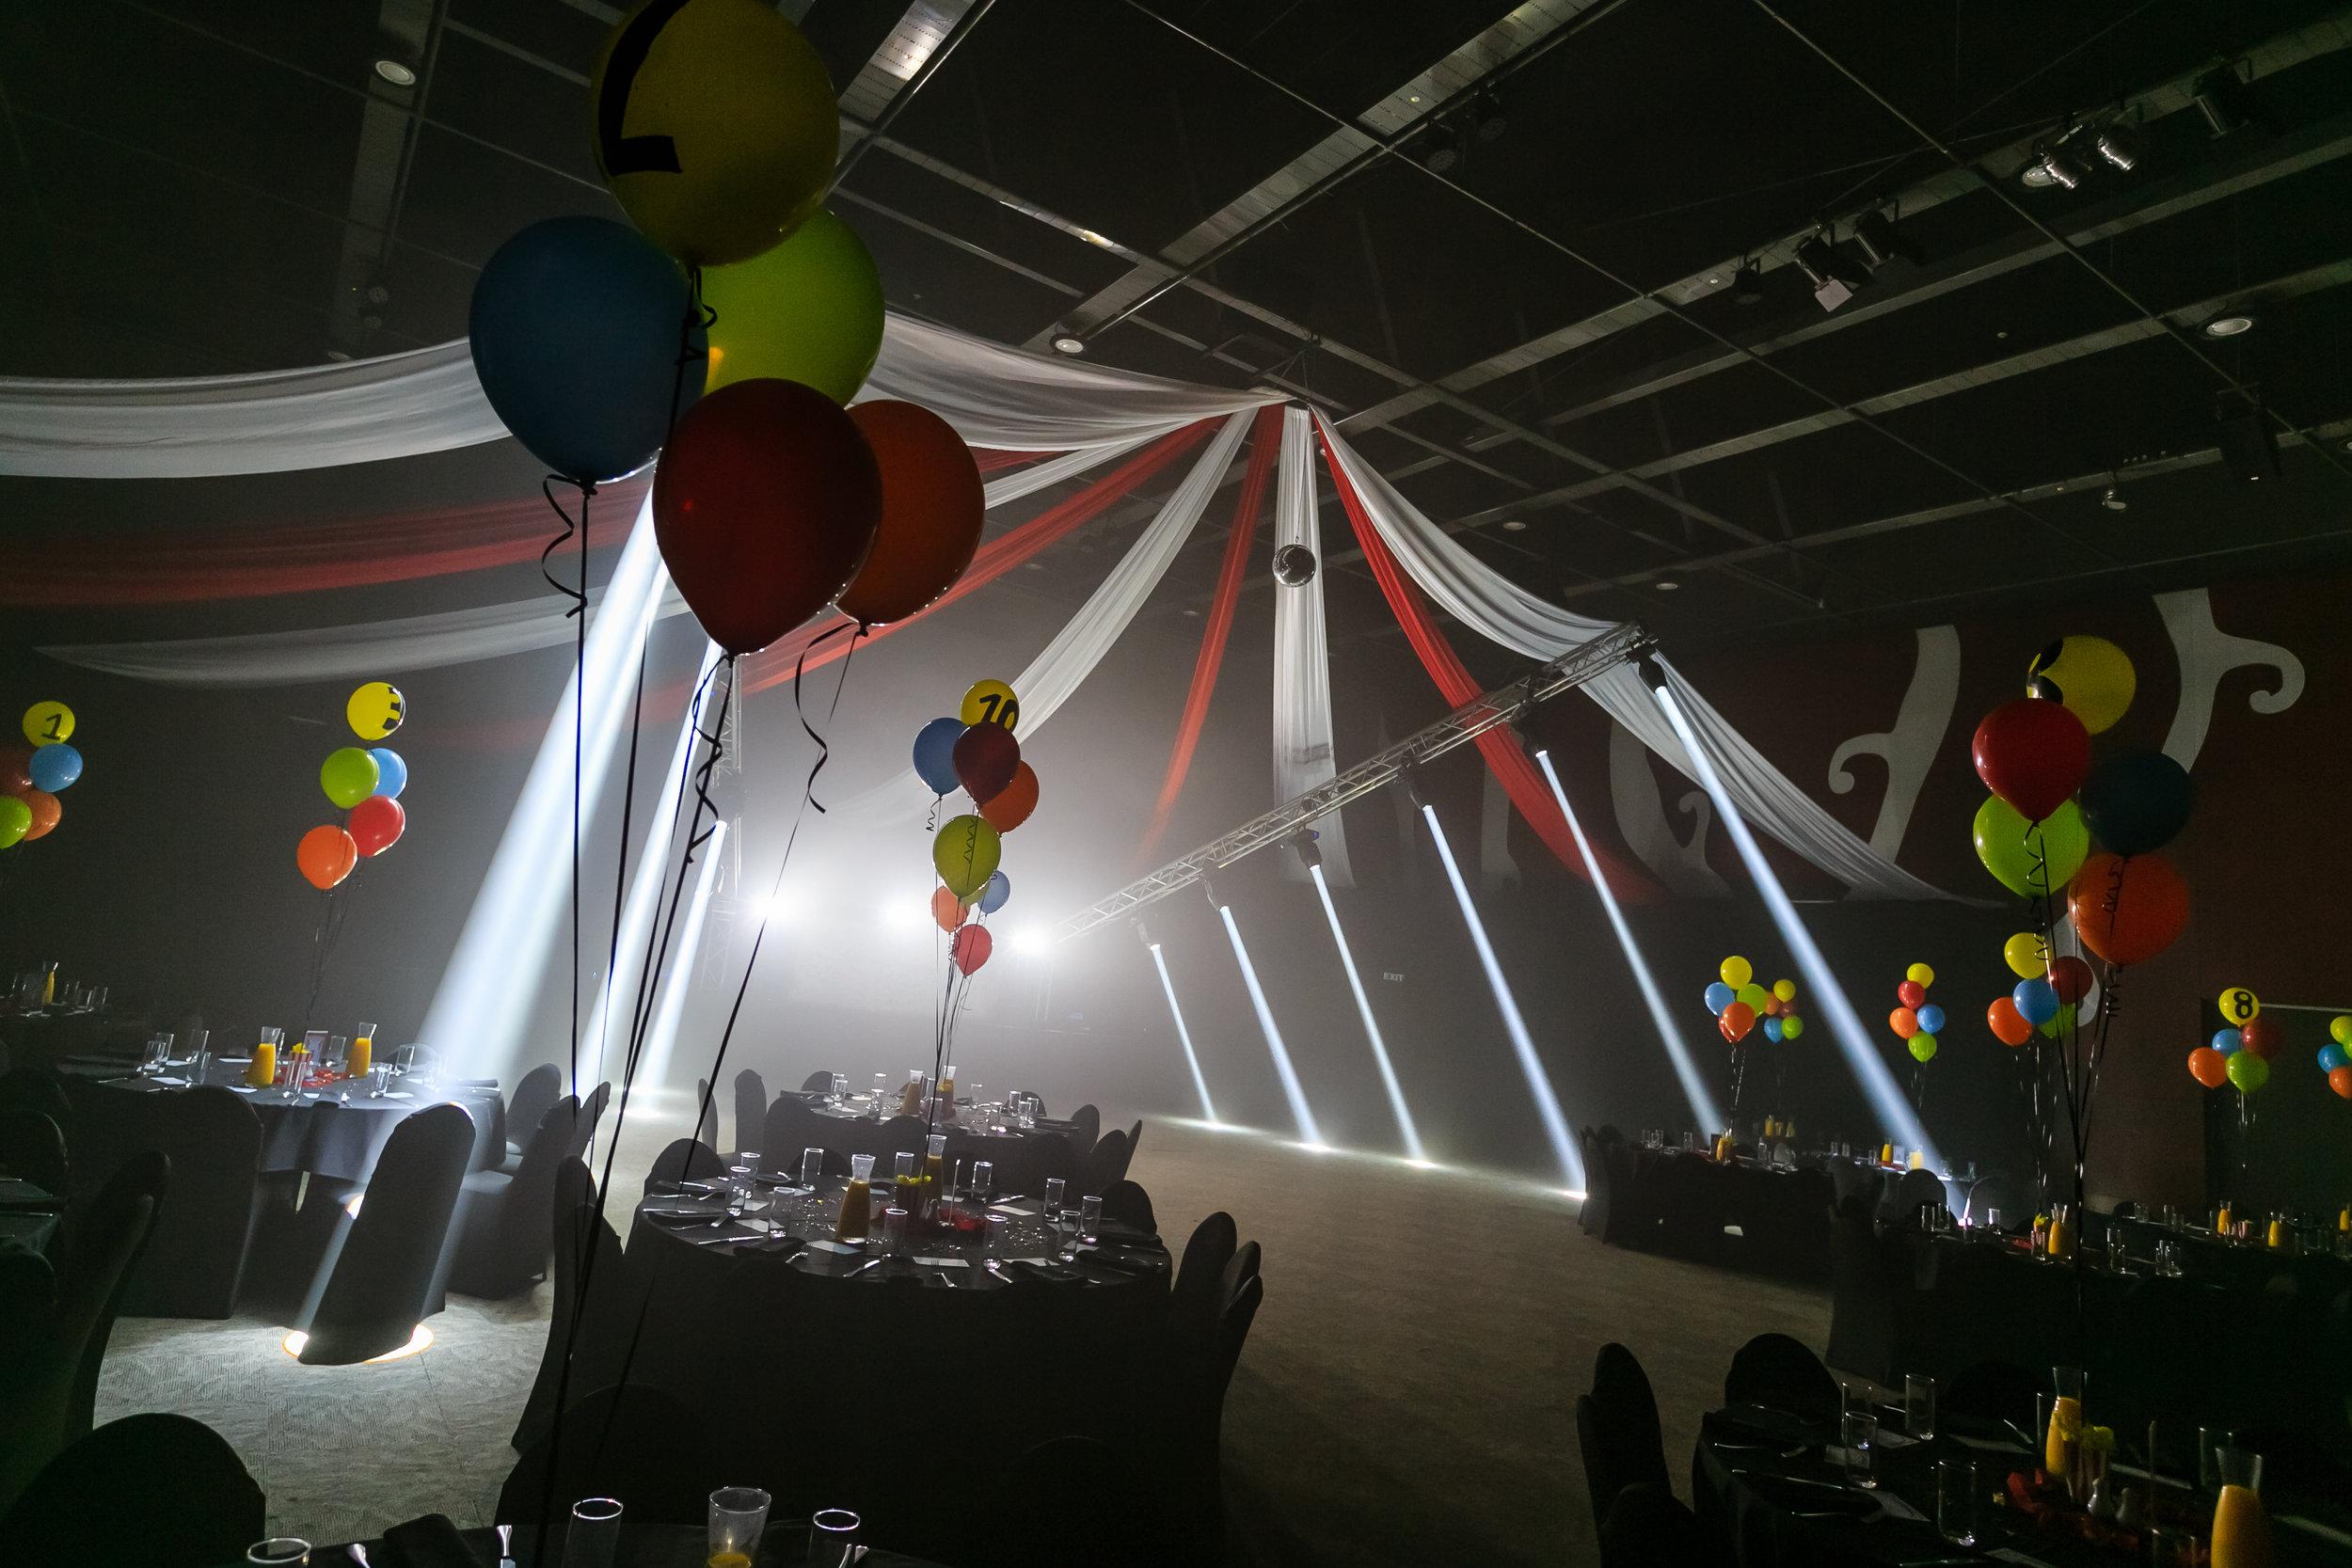 The Circus - John Paul College Ball